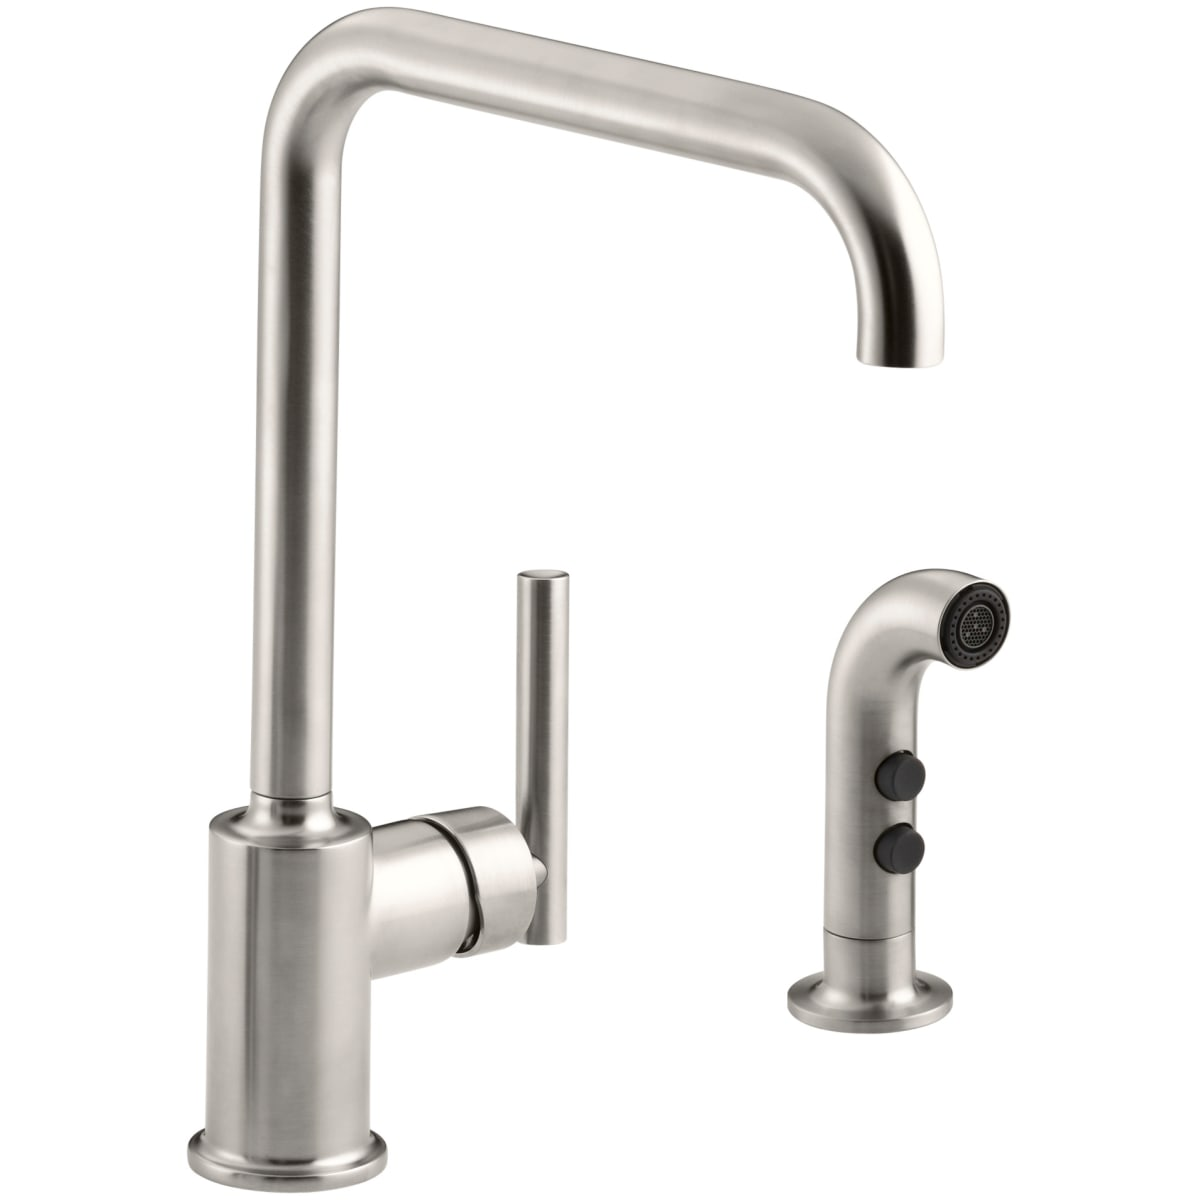 Kohler K 7508 Bl Matte Black Purist High Arch Kitchen Faucet